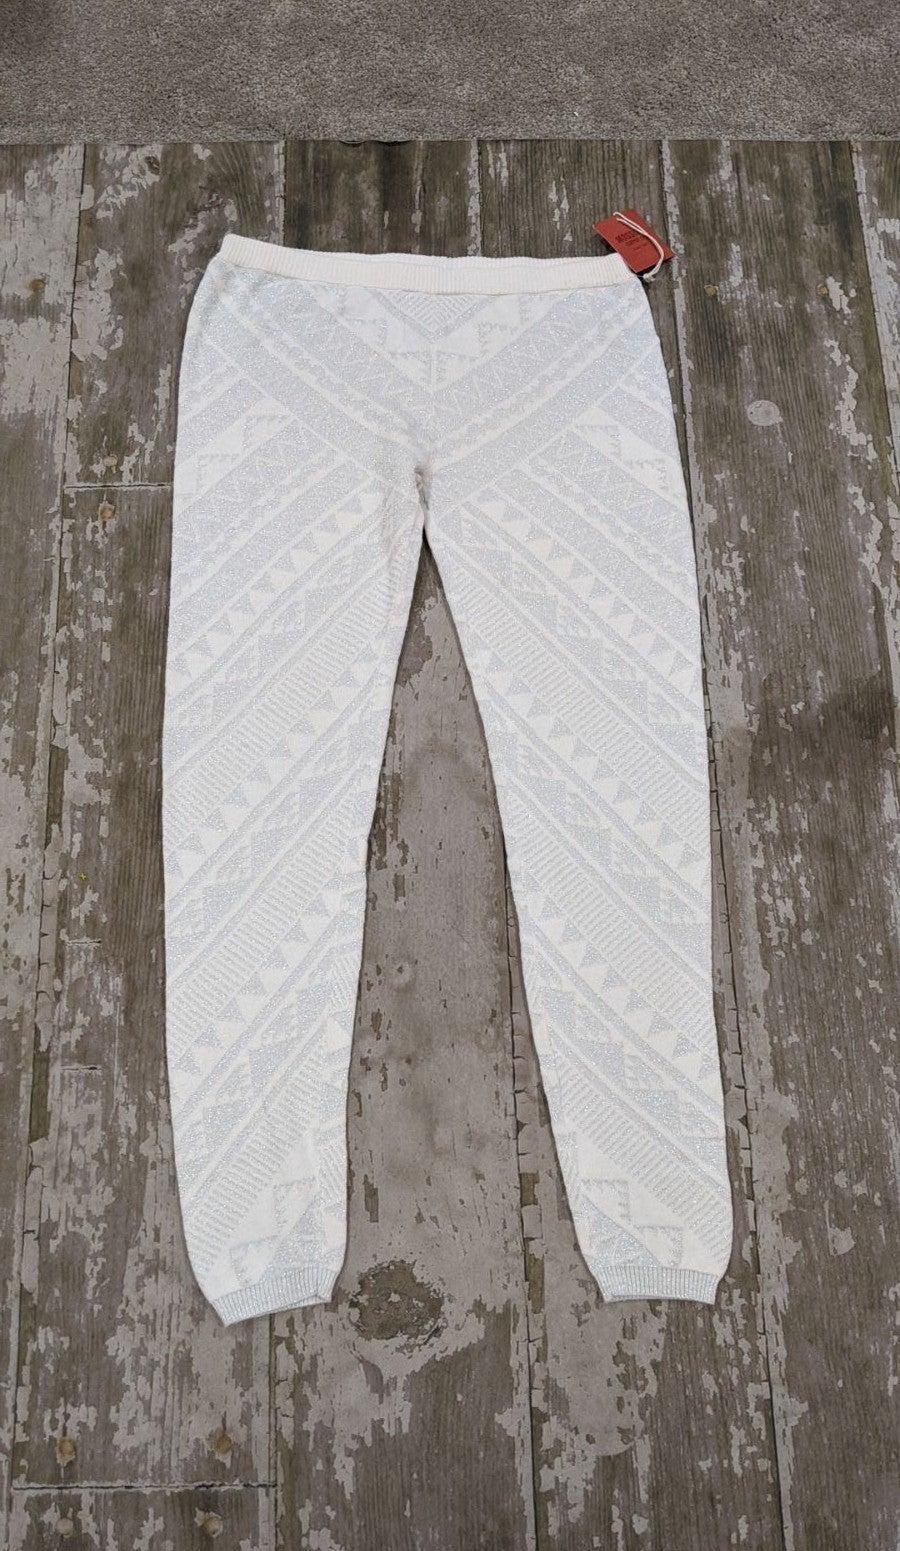 New Mossimo Silver Shimmer Tribal Leggin